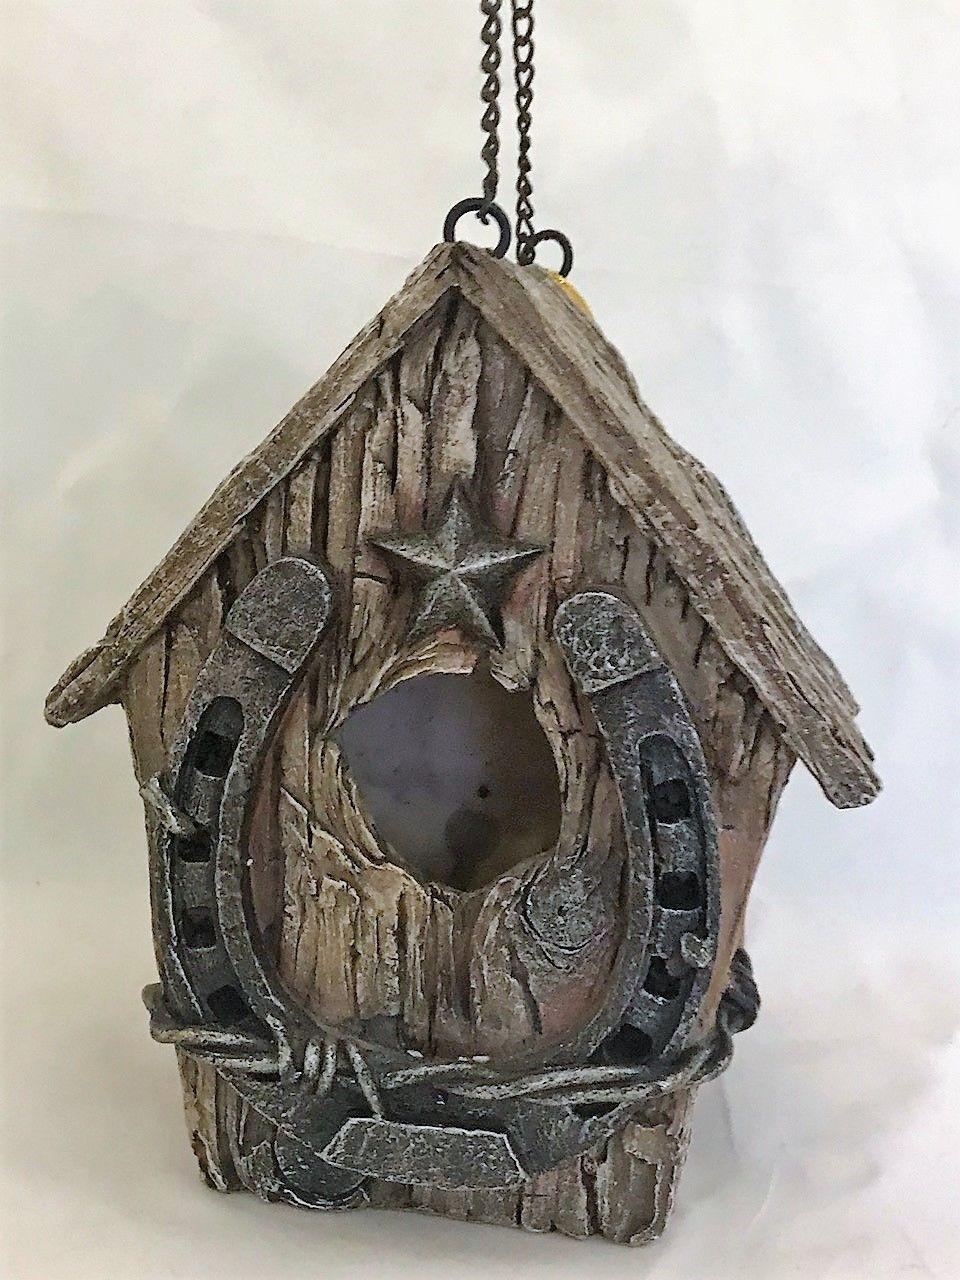 Rustic Western Design Hanging Birdhouse w Horseshoe Detailing Polystone NEW